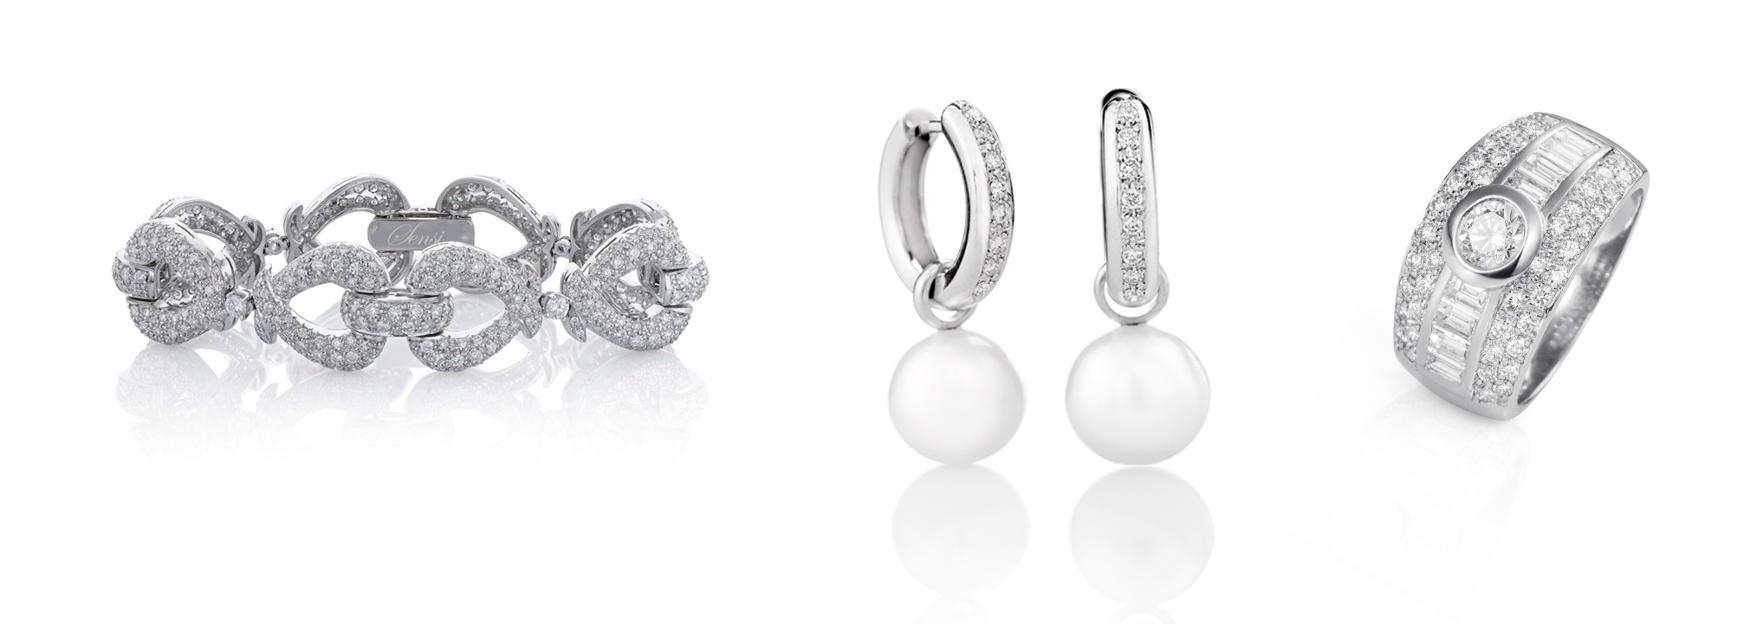 Sensi Joyas Jewellery Granada city center best design bespoke diamonds engagement high quality silver rings bracelets